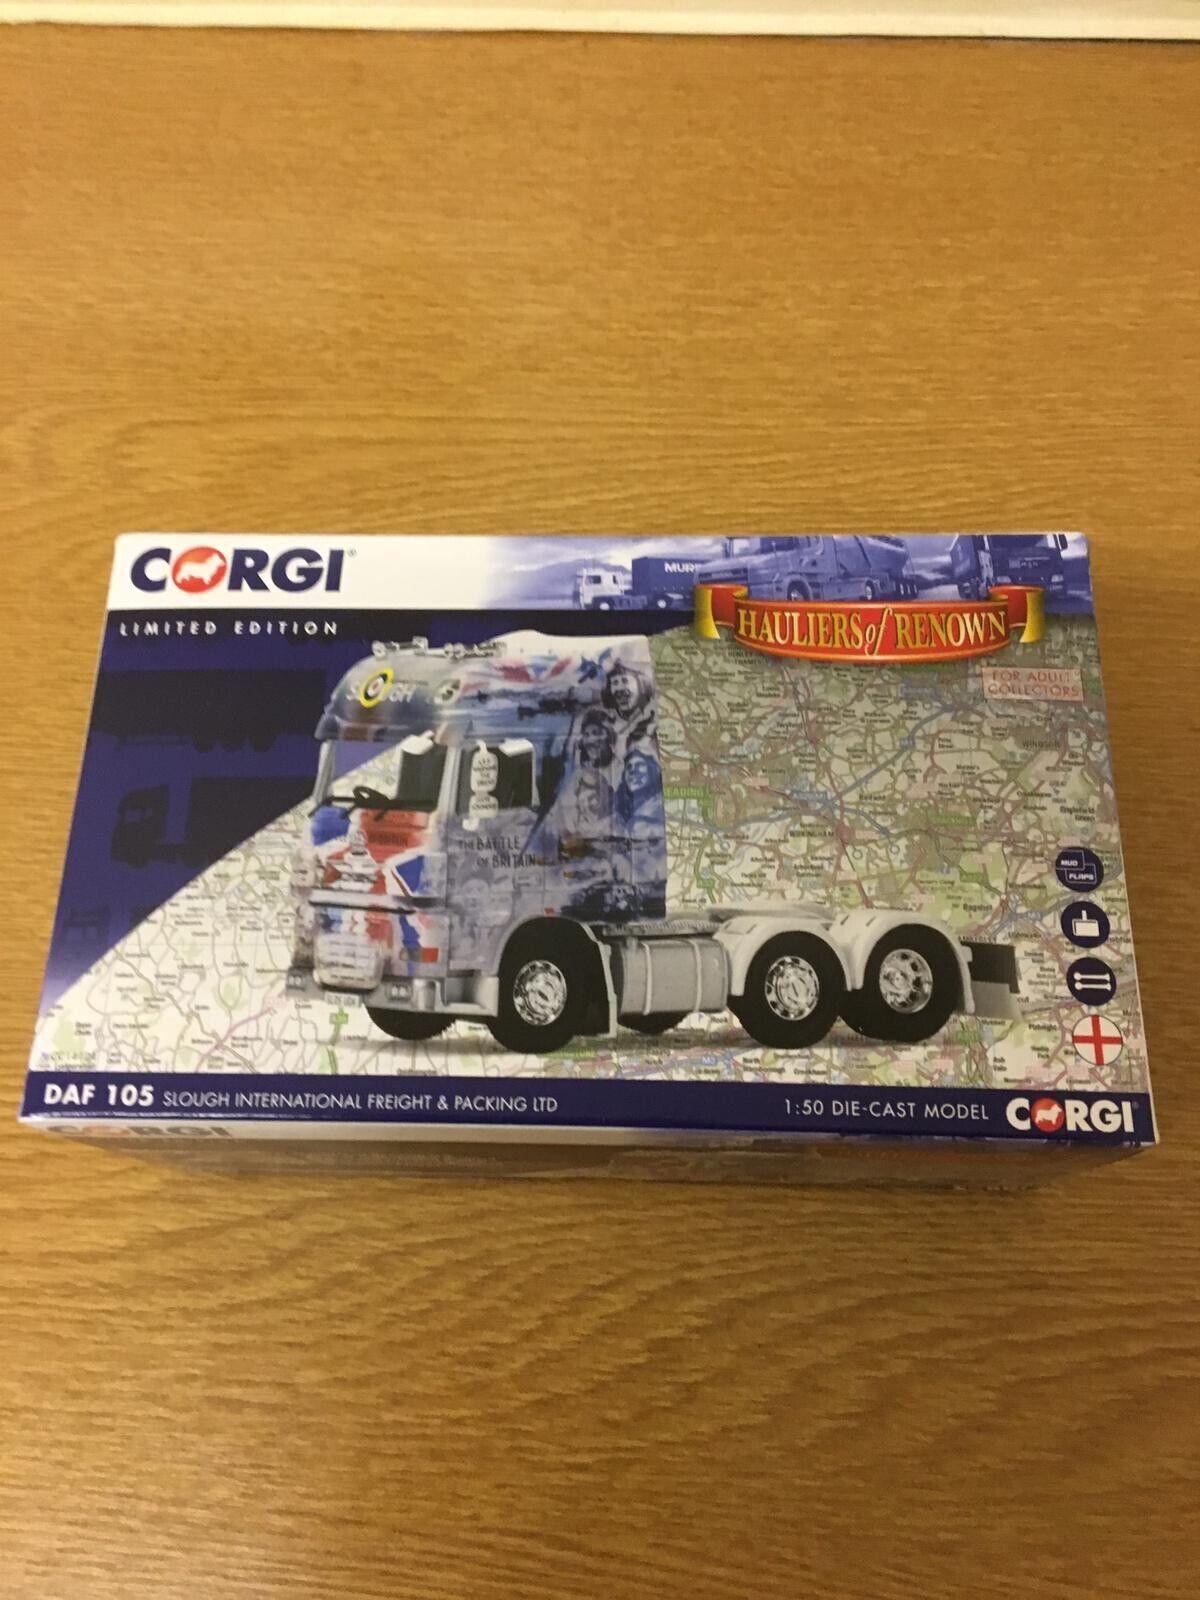 Corgi DAF 105 Slough International Freight & Packing LTD 1 50 Scale